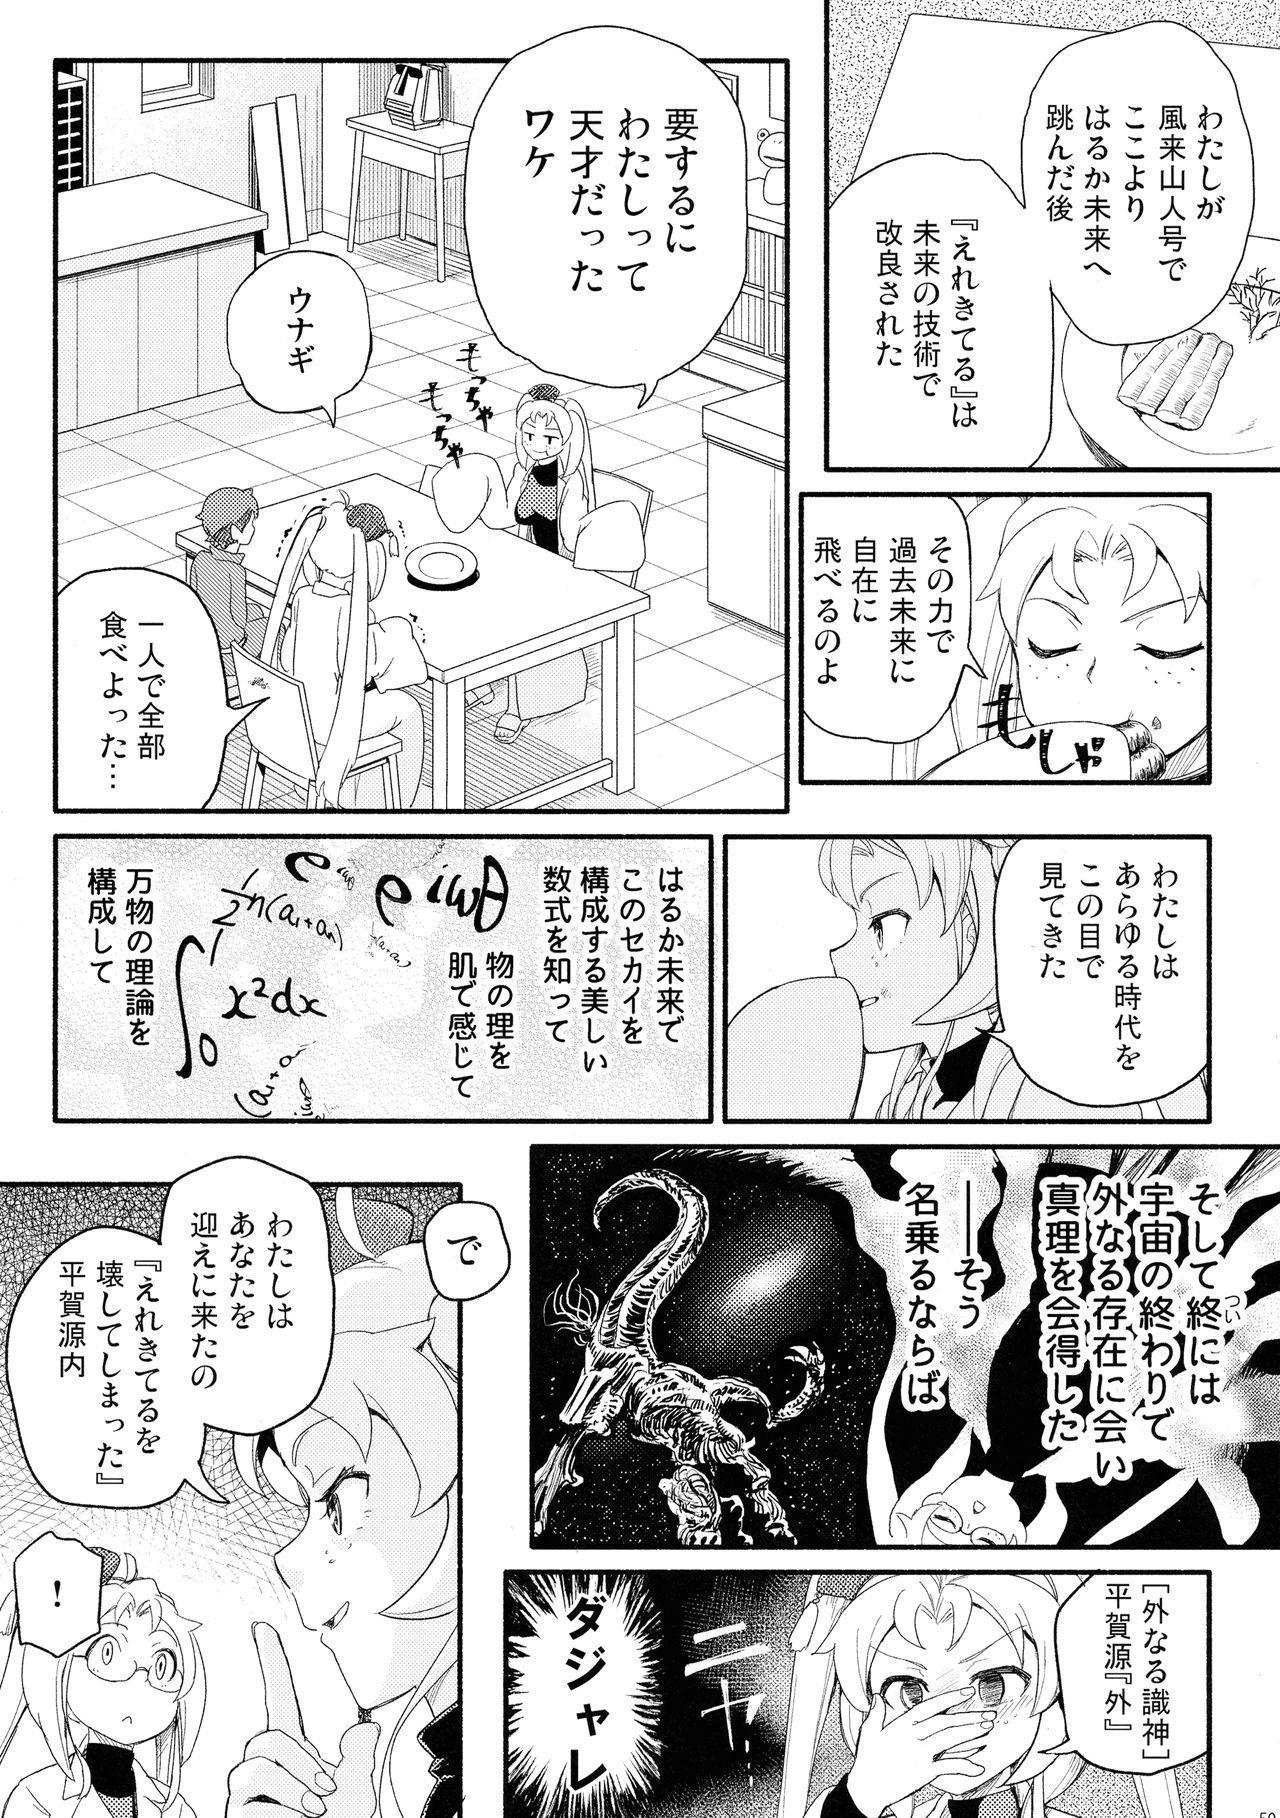 Muhou!! Hiraga Gennai-chan Ecchi Goudoushi 49